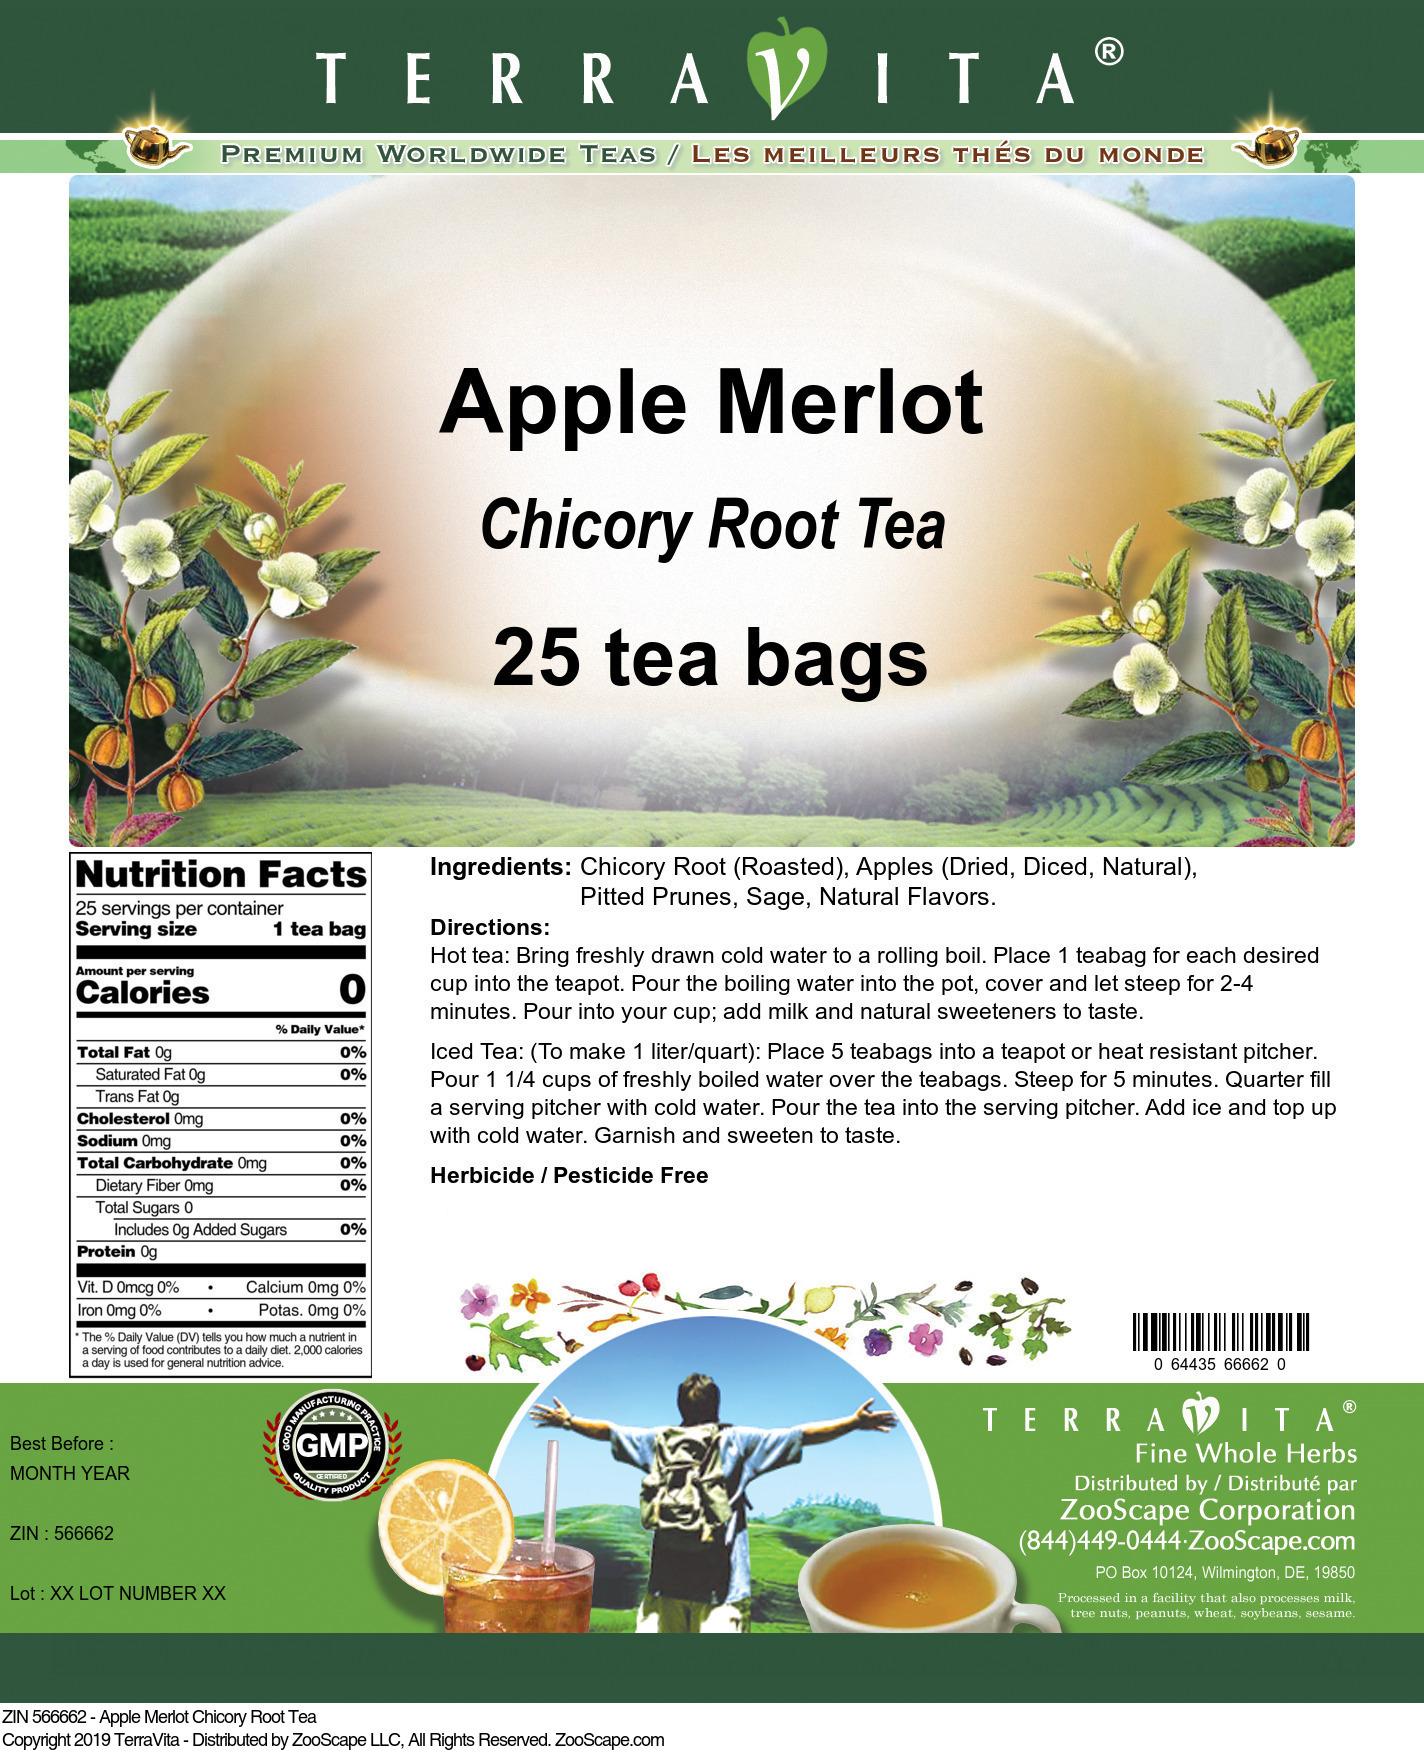 Apple Merlot Chicory Root Tea